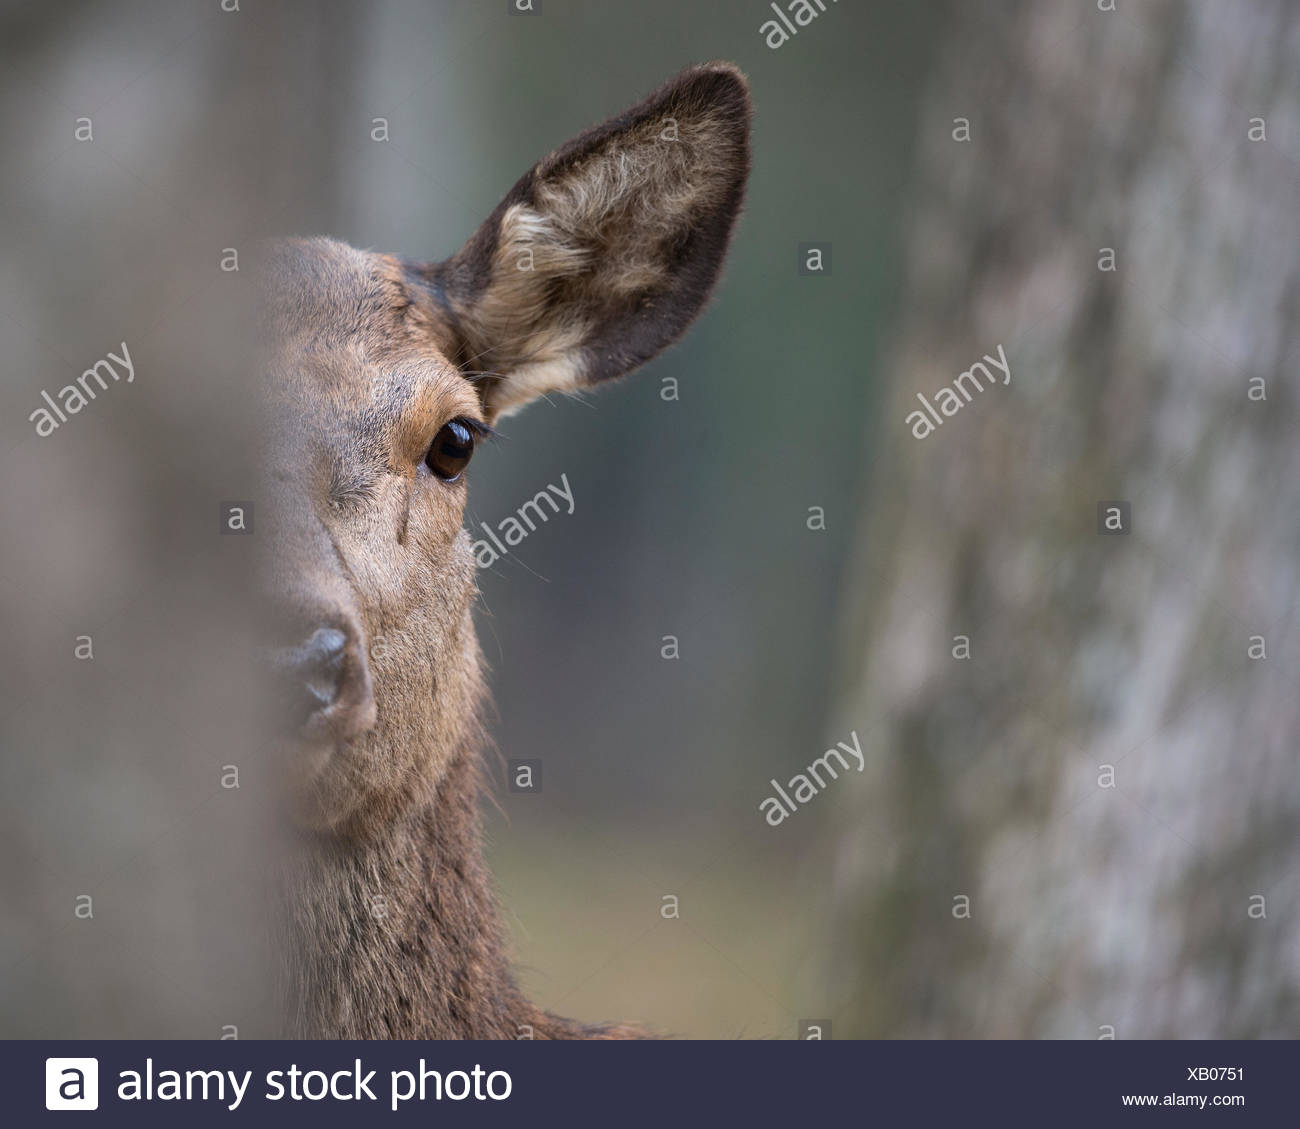 Red deer (Cervus elaphus),female,adult animal hides behind tree,Rhineland-Palatinate,Germany Stock Photo